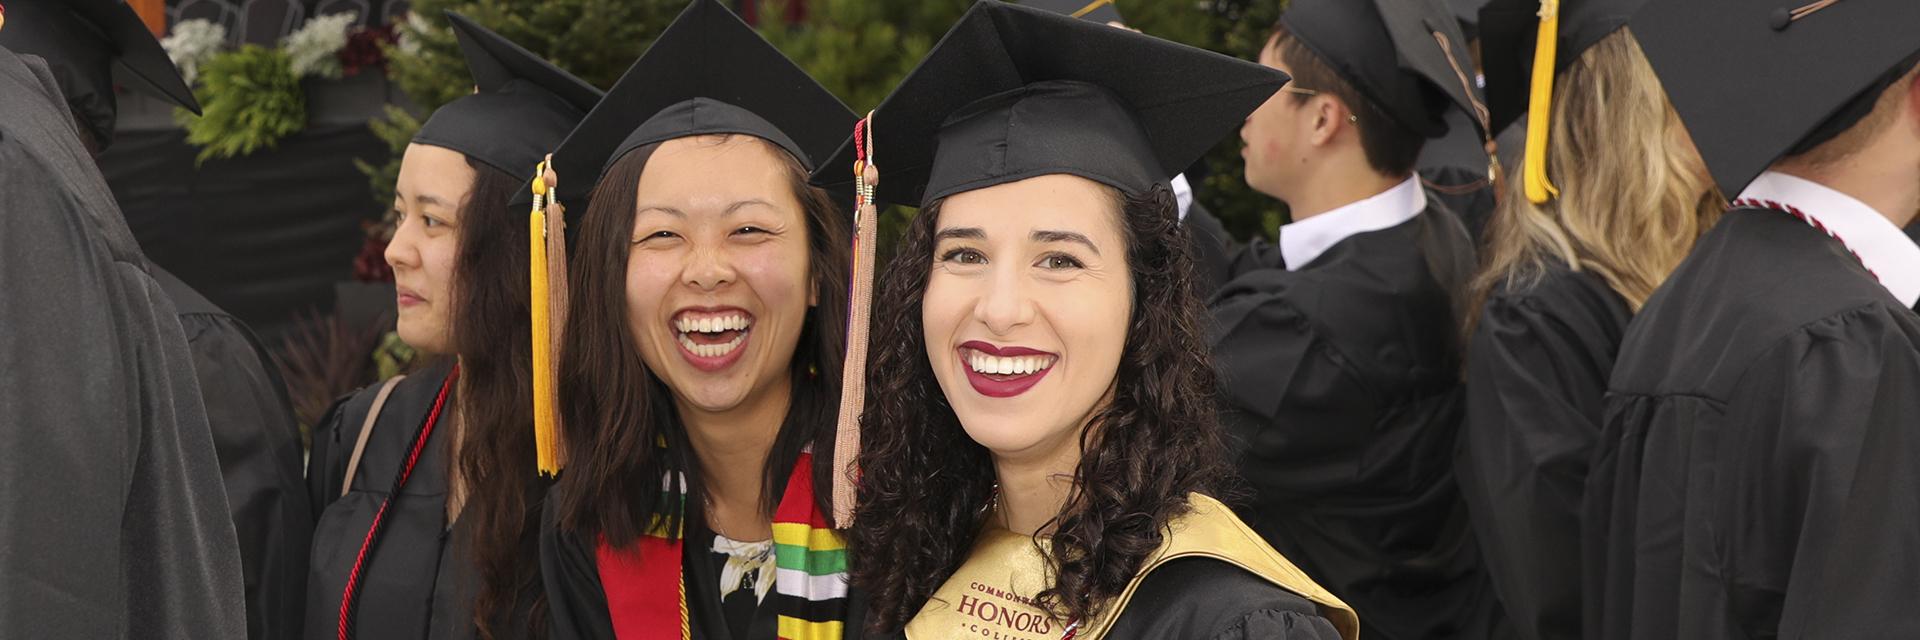 Students at UMass Undergraduate Commencement 2019